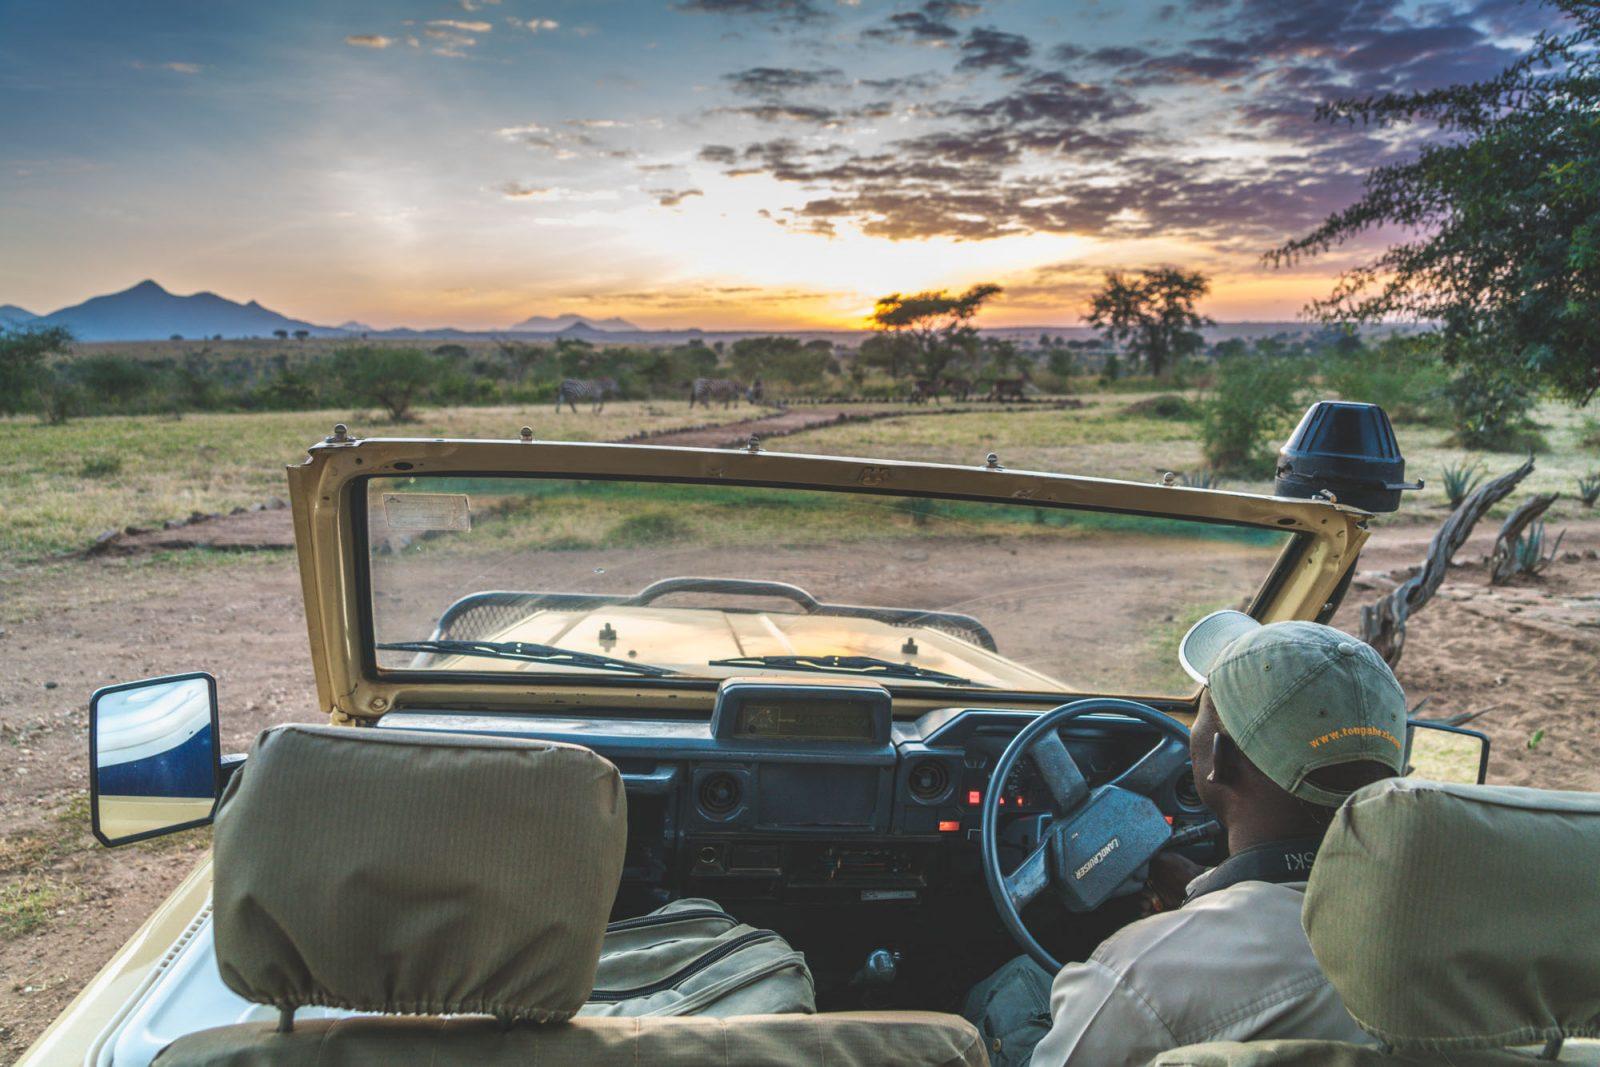 On a safari with Julius